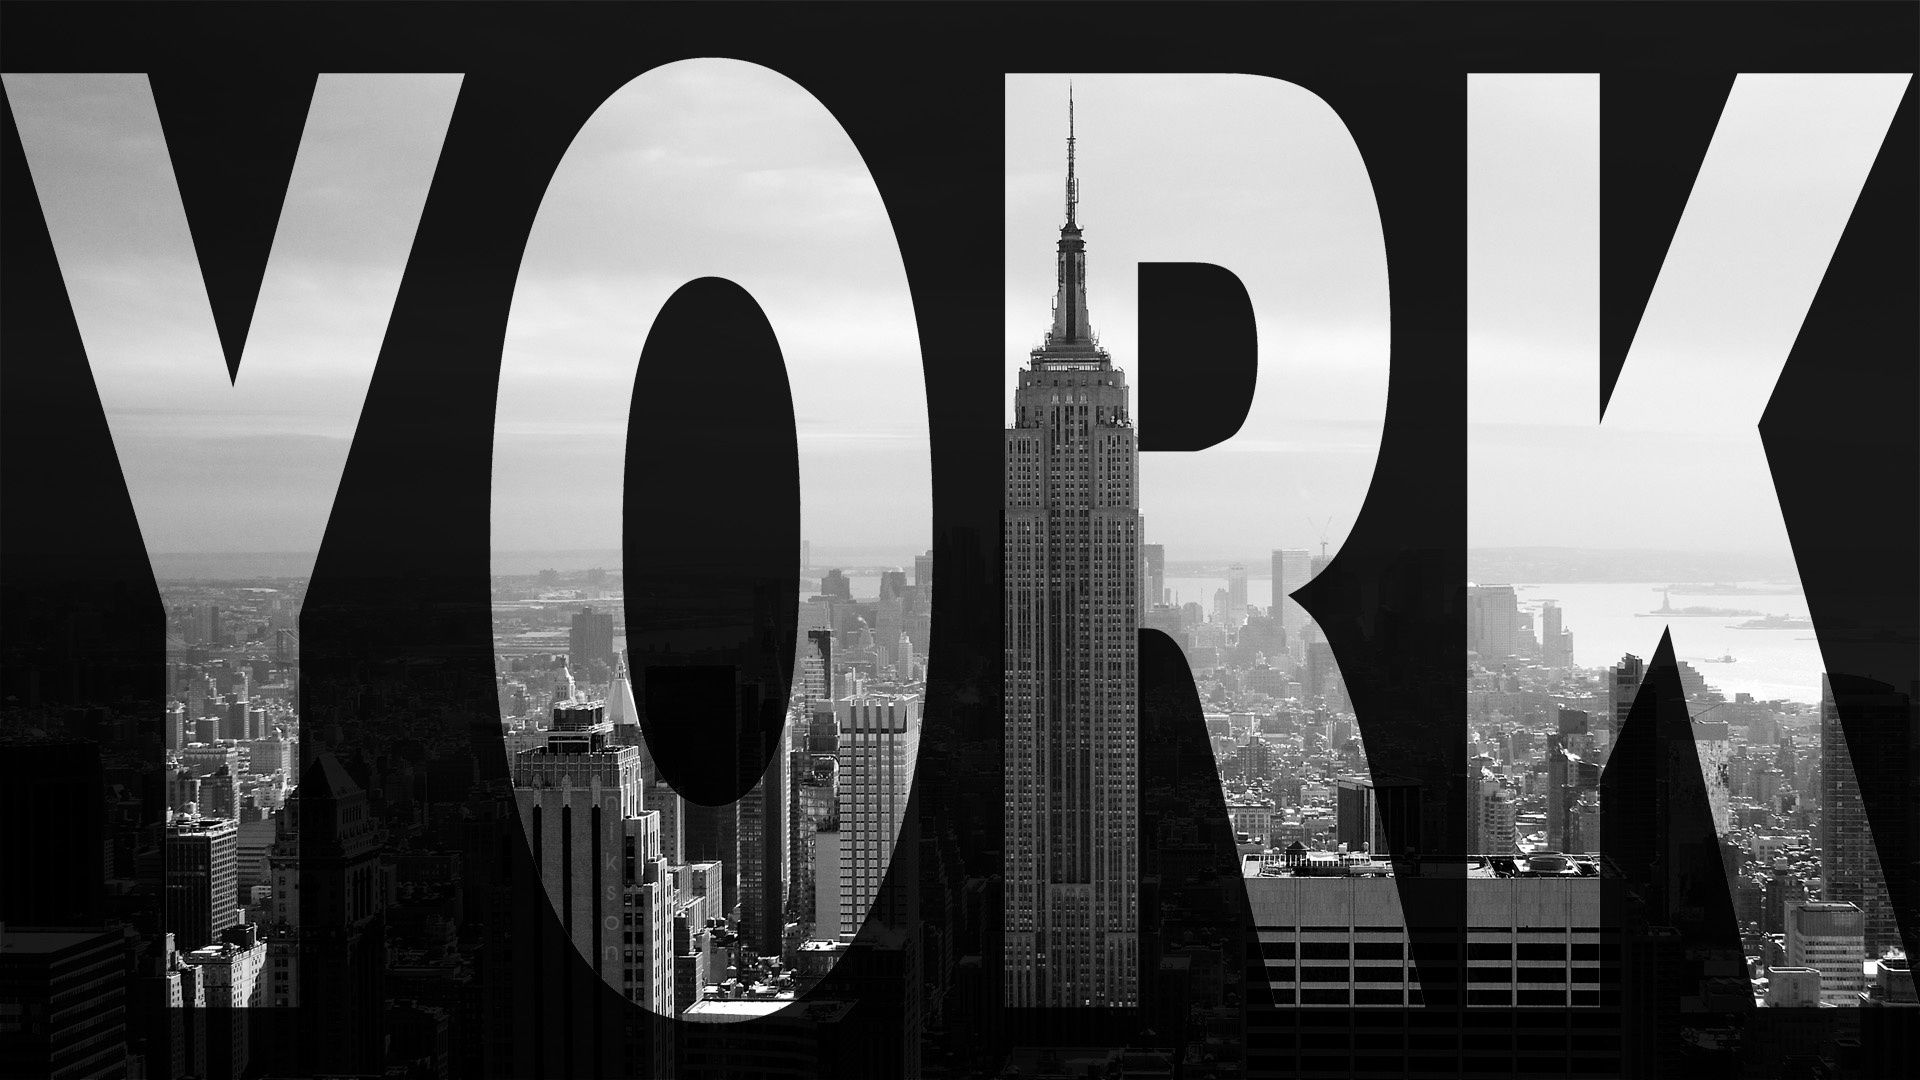 New York 1080p 1080p Wallpaper Hdtv Hd Wallpapers Background